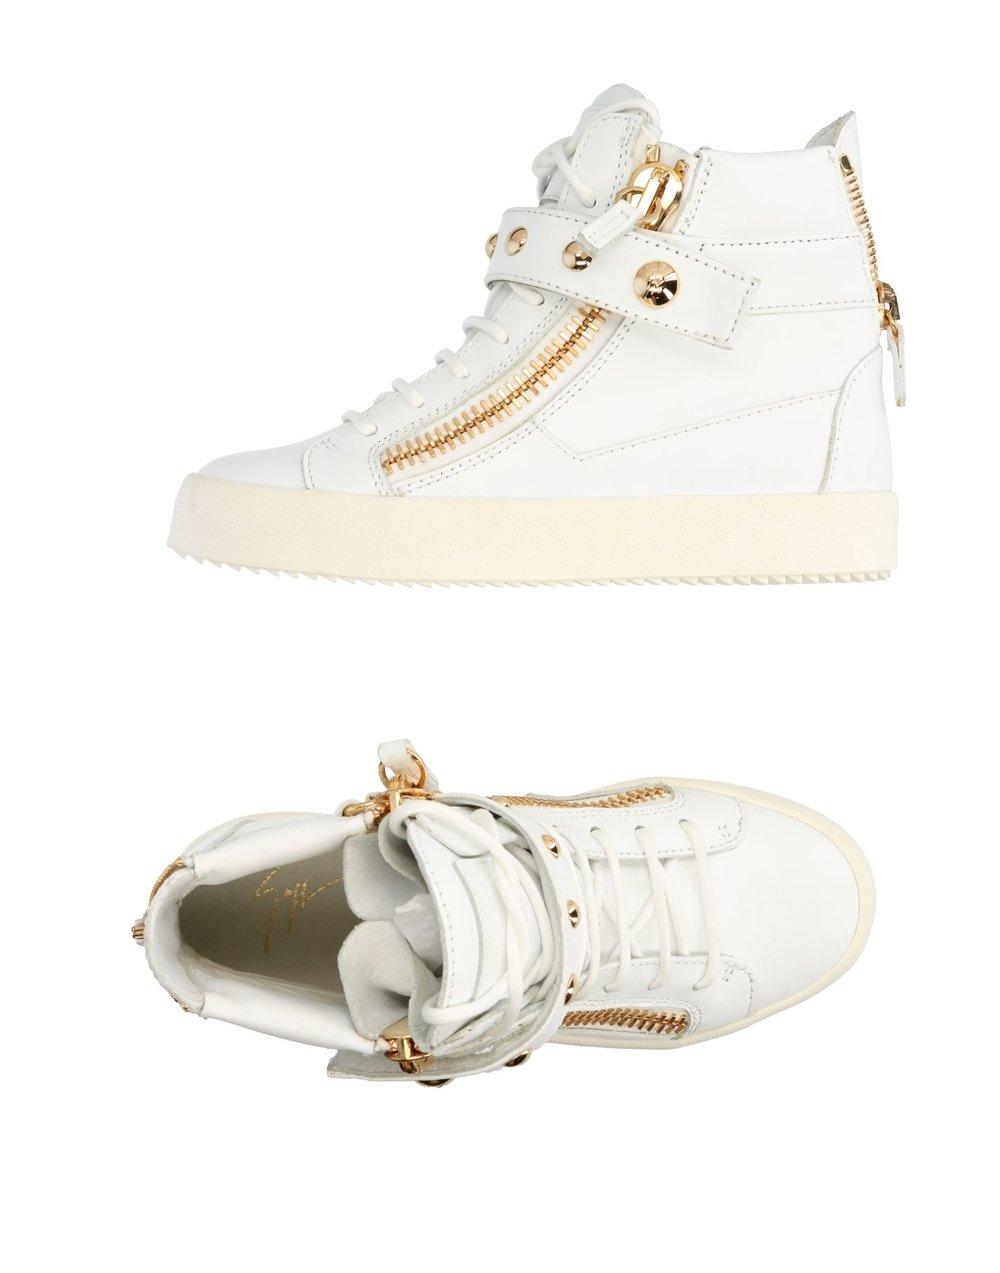 GIUSEPPE ZANOTTI DESIGN Sneakers      $ 690.00